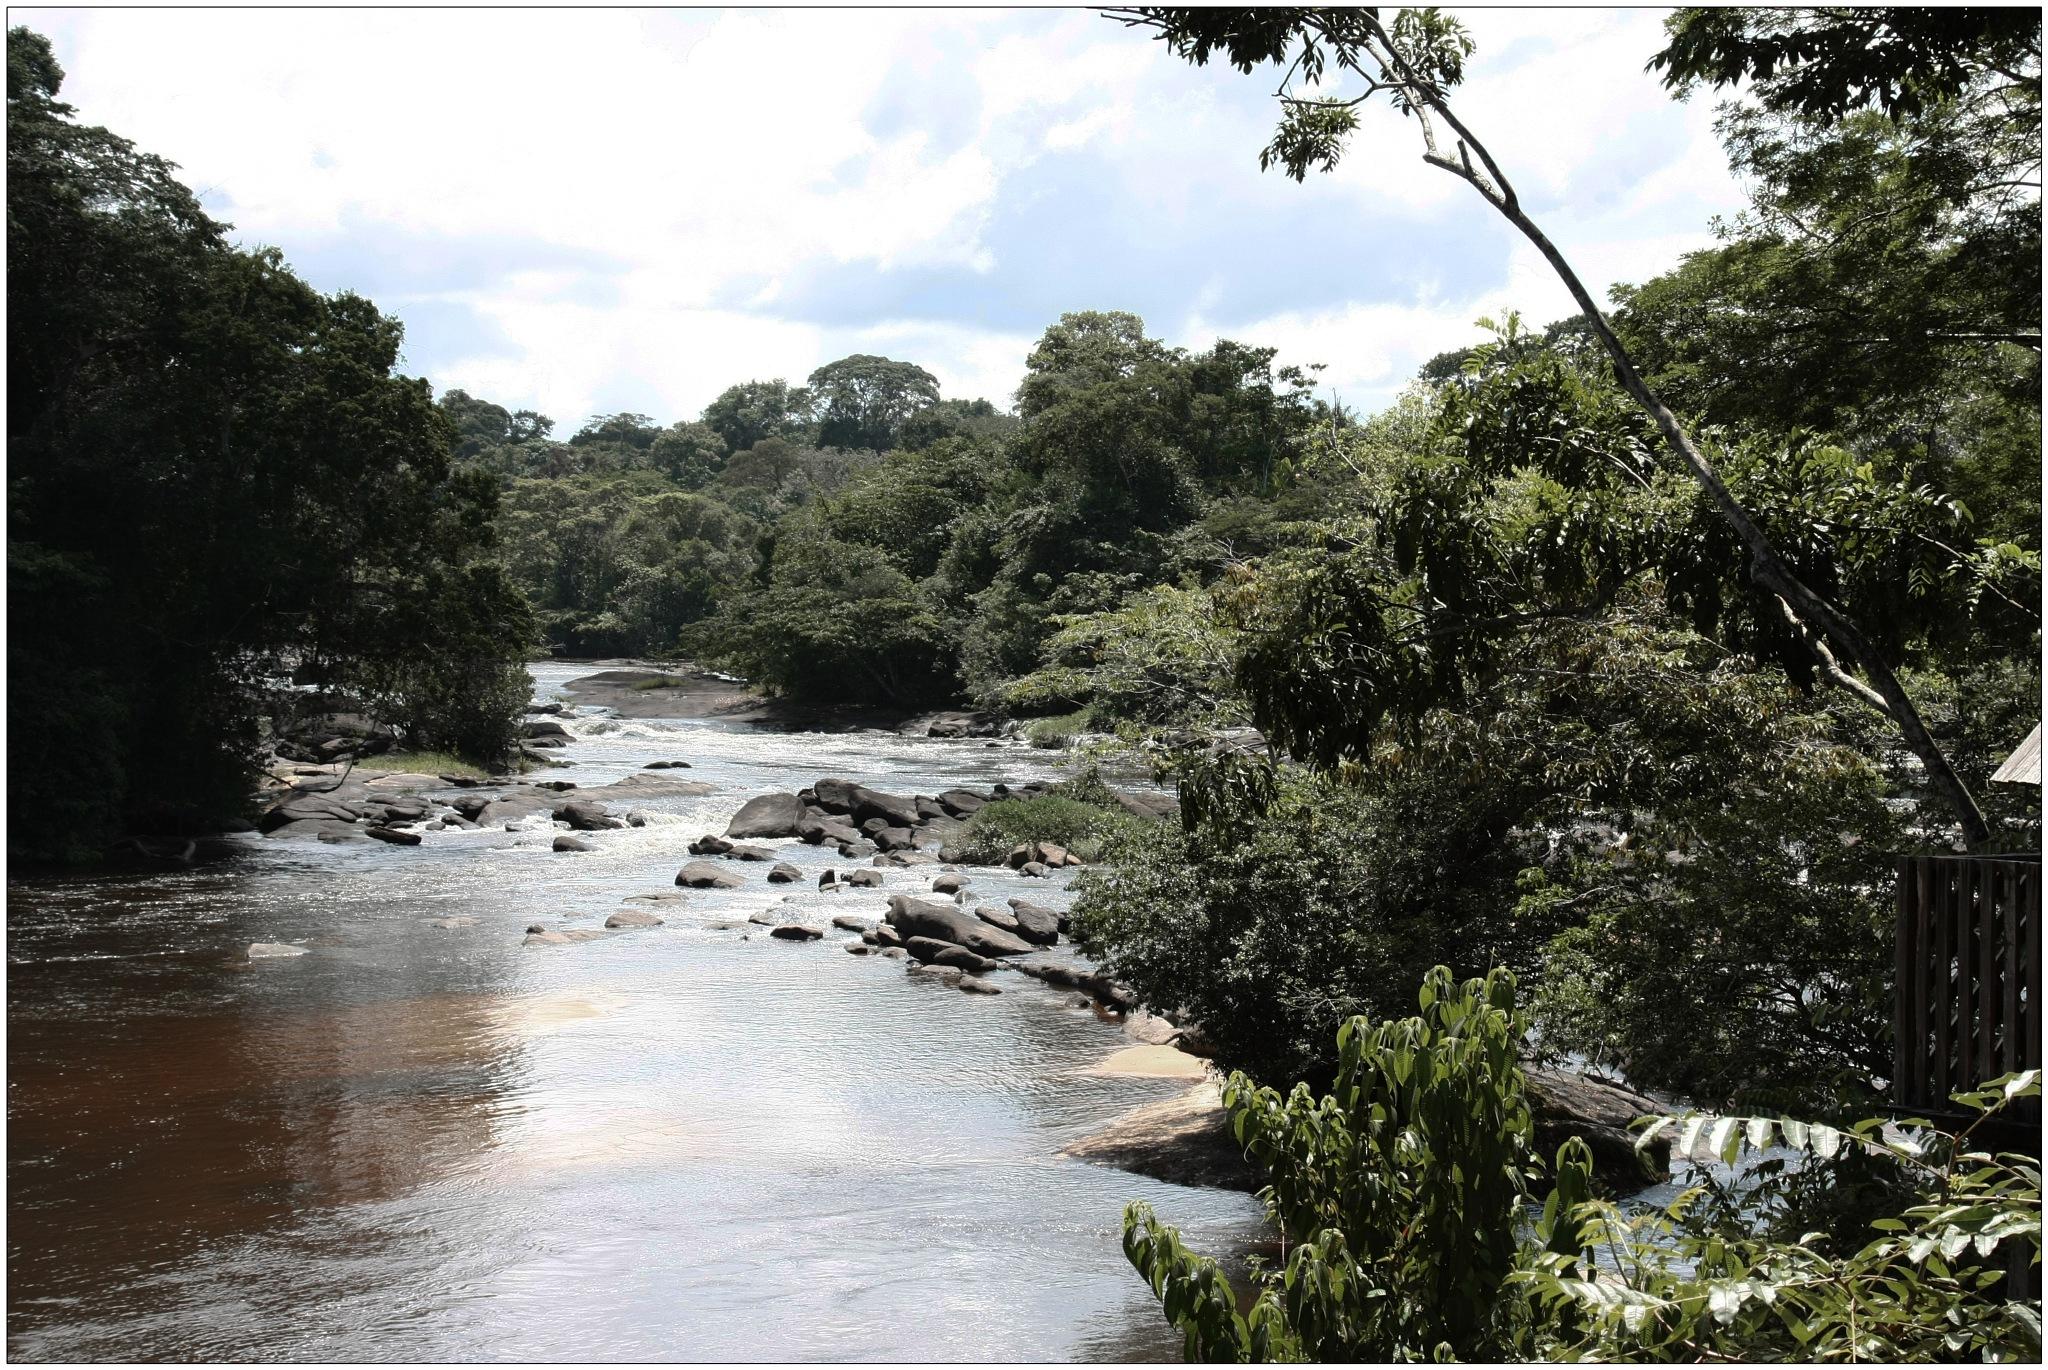 Surinam bush- river by ad.kesteloo